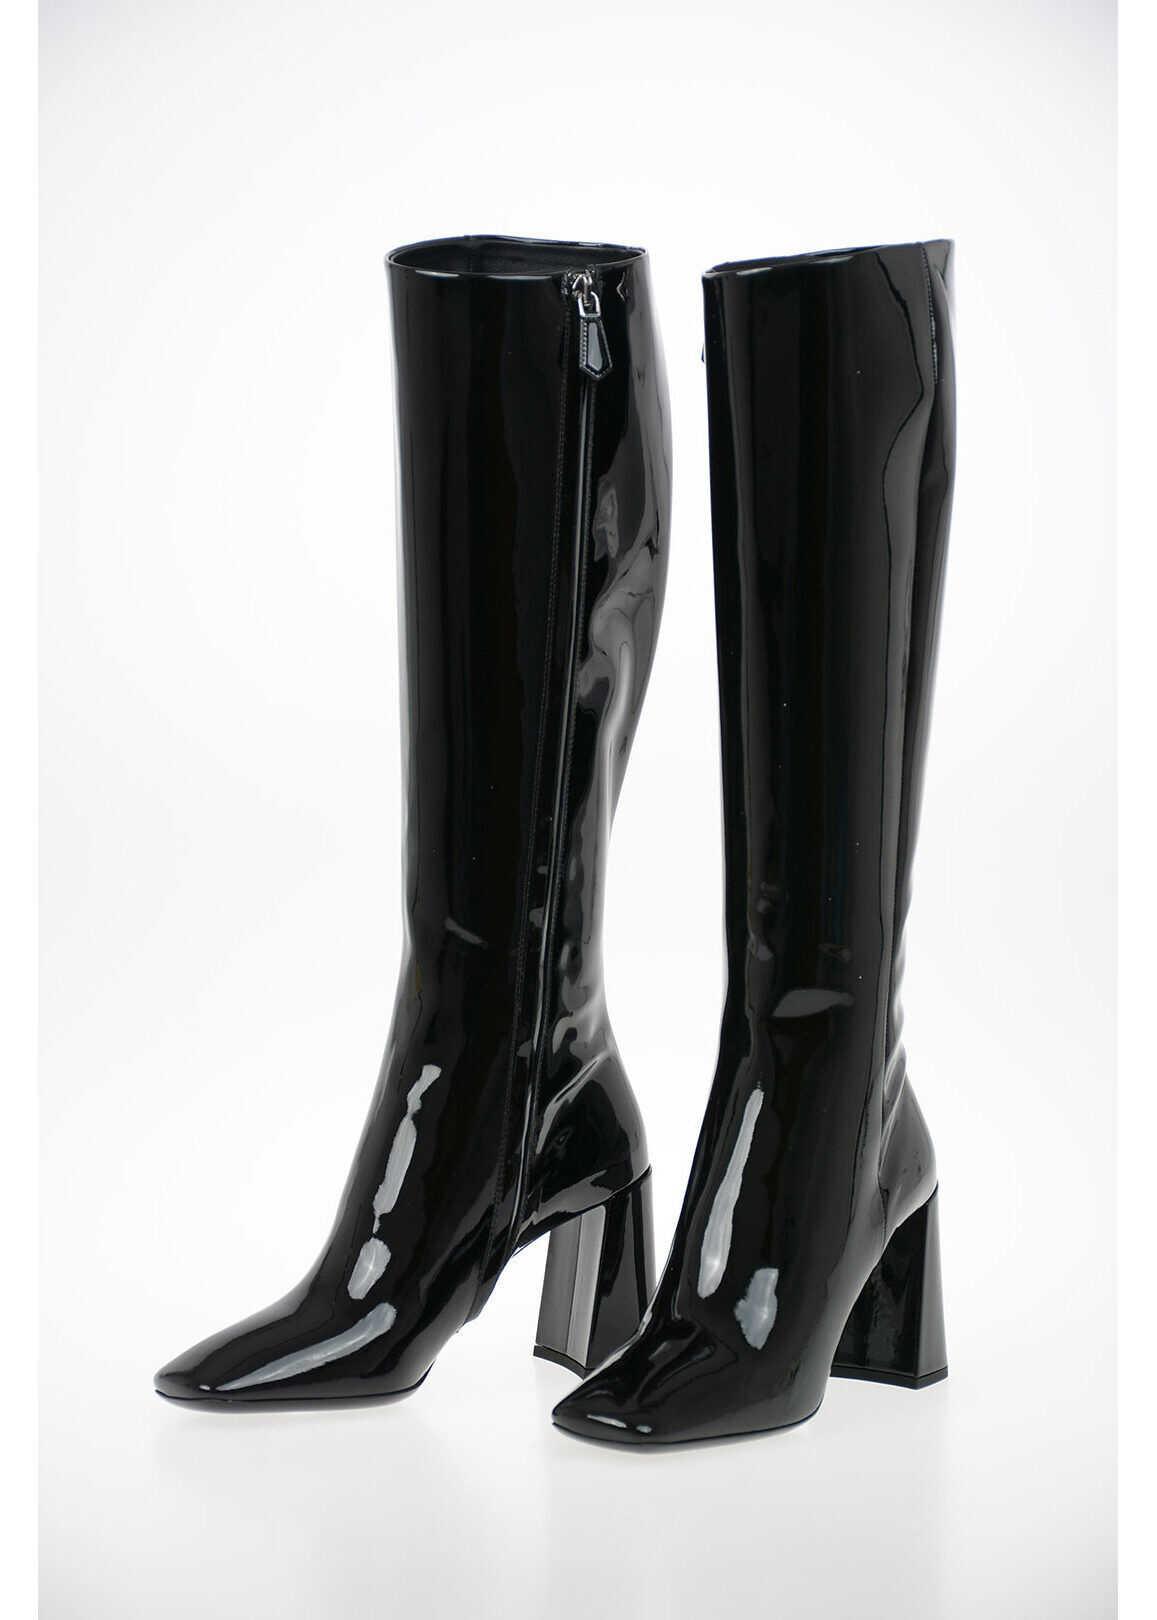 Prada Lacquered Leather Knee Length Boots 9 cm BLACK imagine b-mall.ro